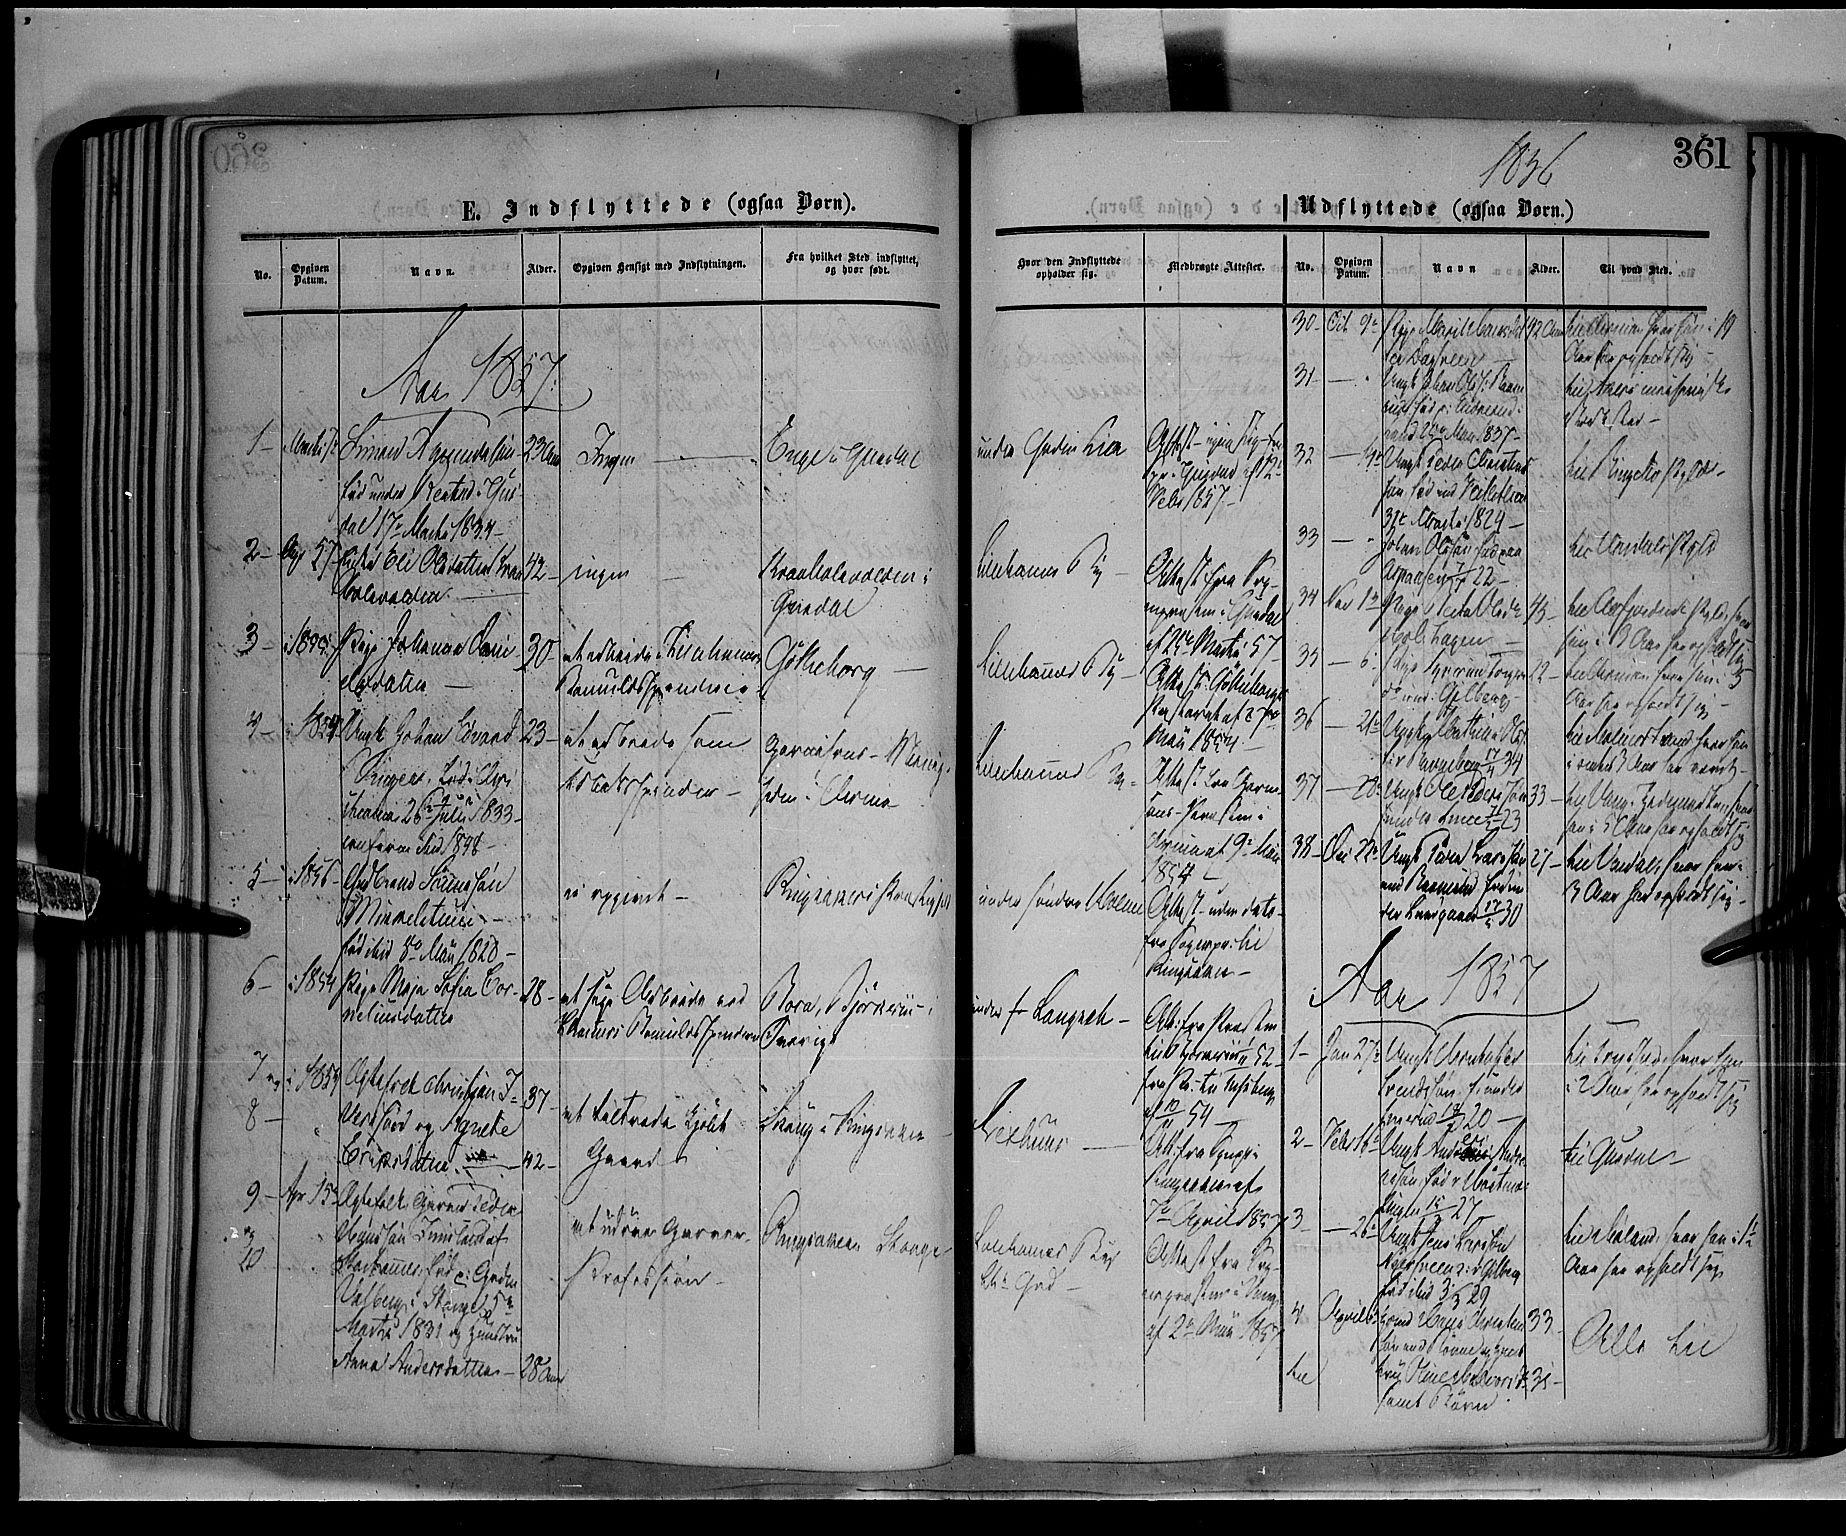 SAH, Fåberg prestekontor, Ministerialbok nr. 6B, 1855-1867, s. 361